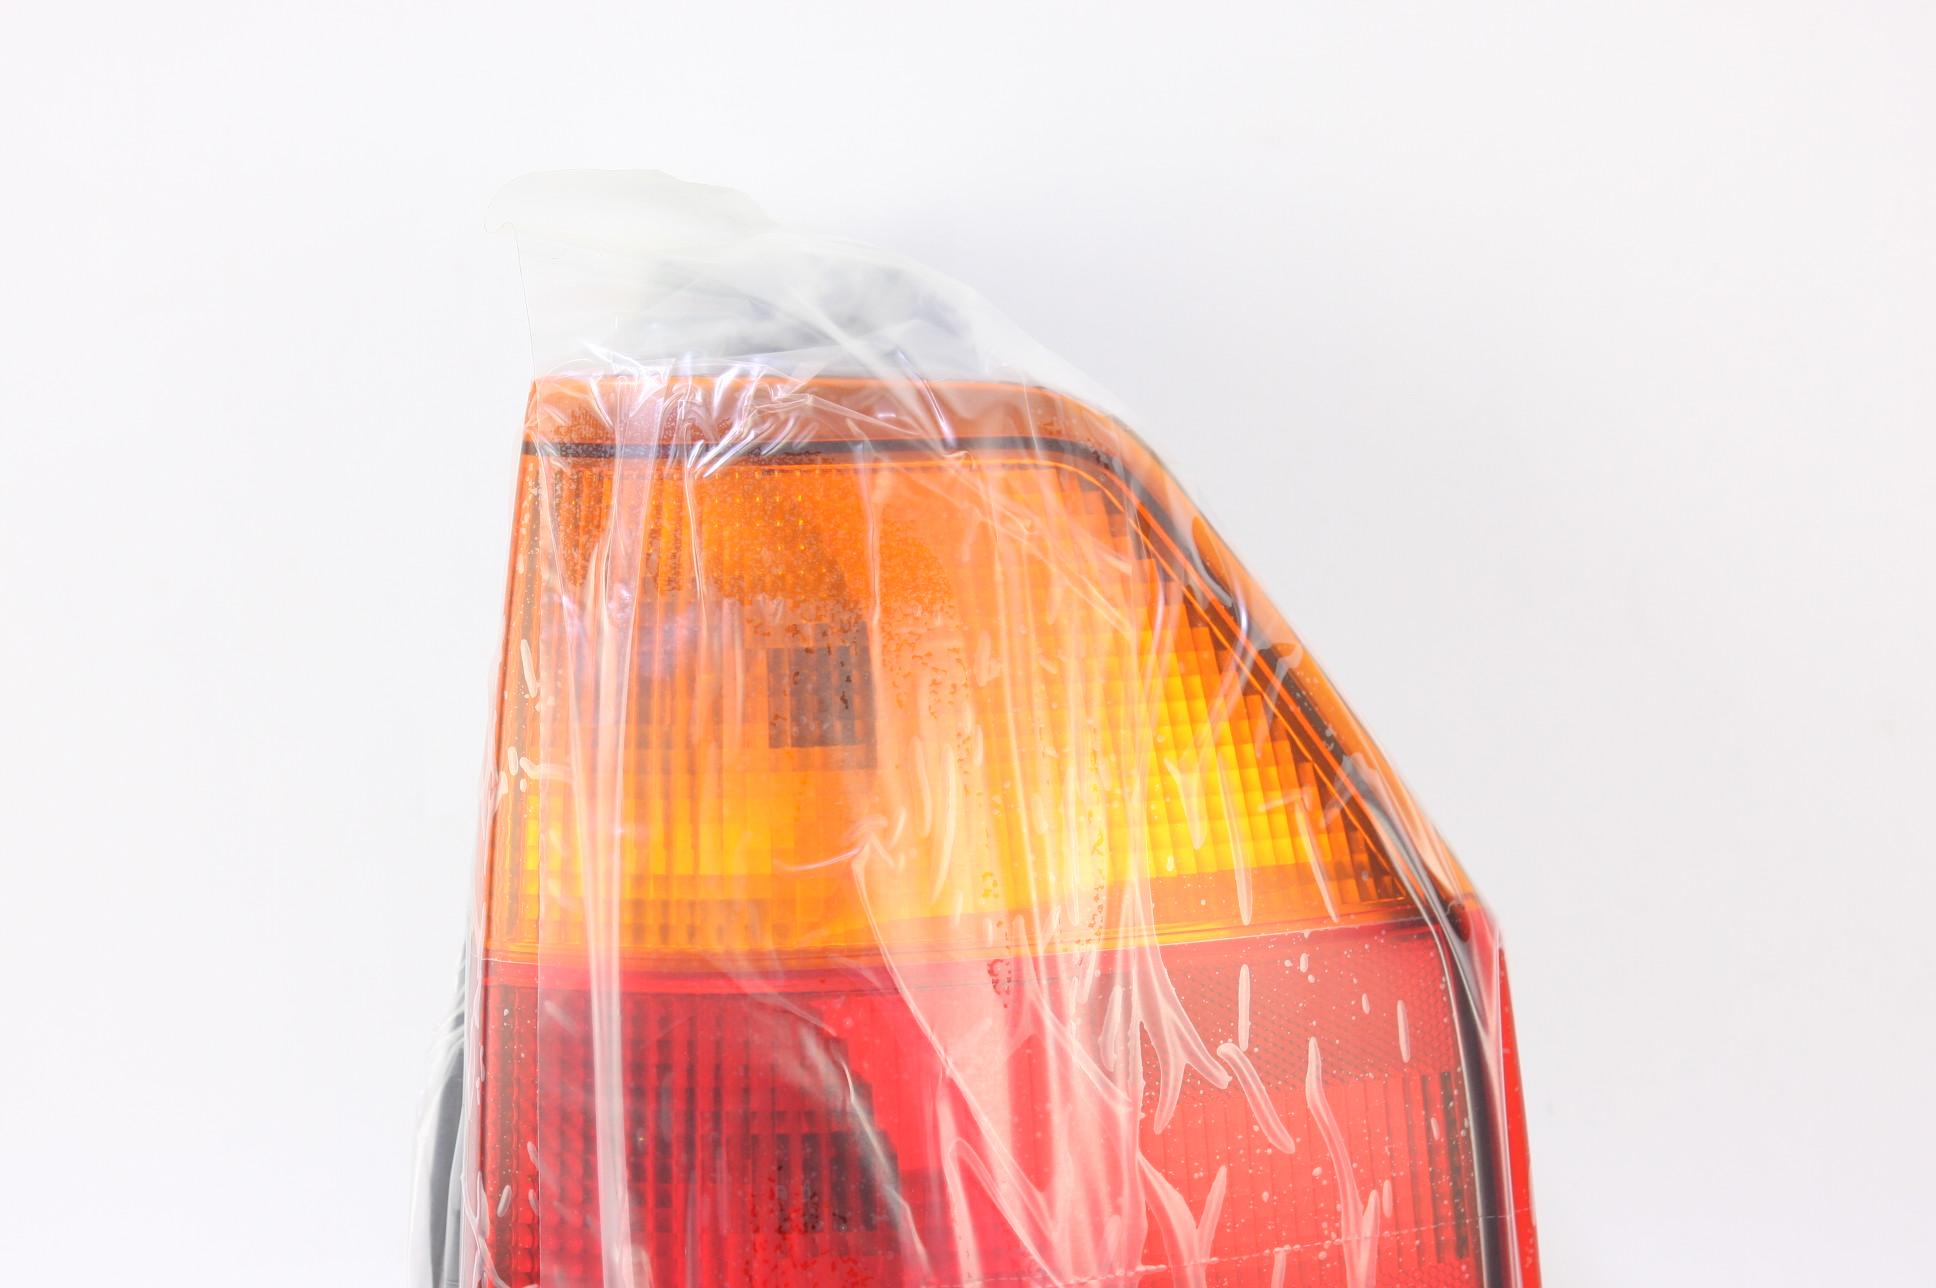 *New OEM GM 15131577 GMC Envoy 02-09 Right Rear Brake Taillight Taillamp Lens - image 2